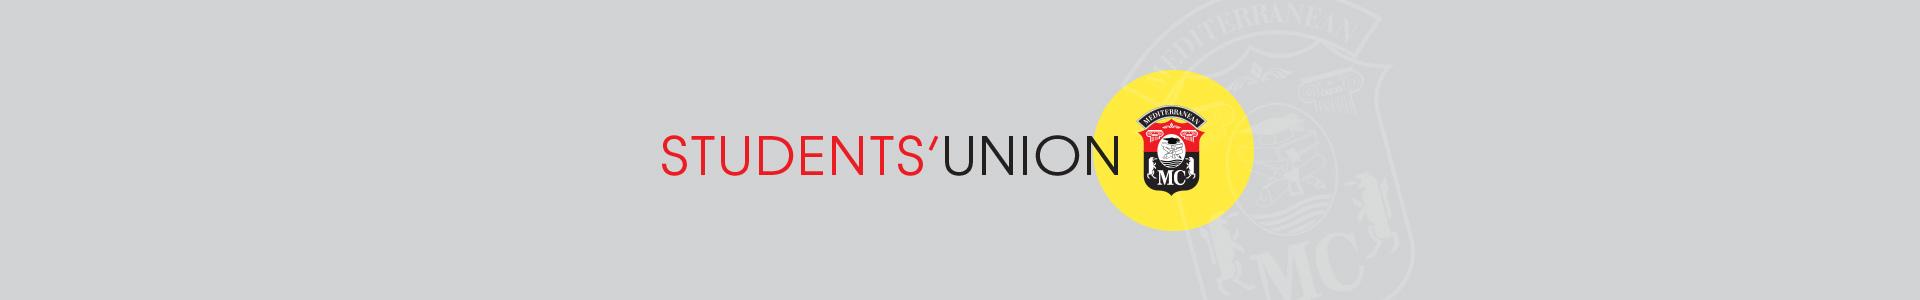 students-union